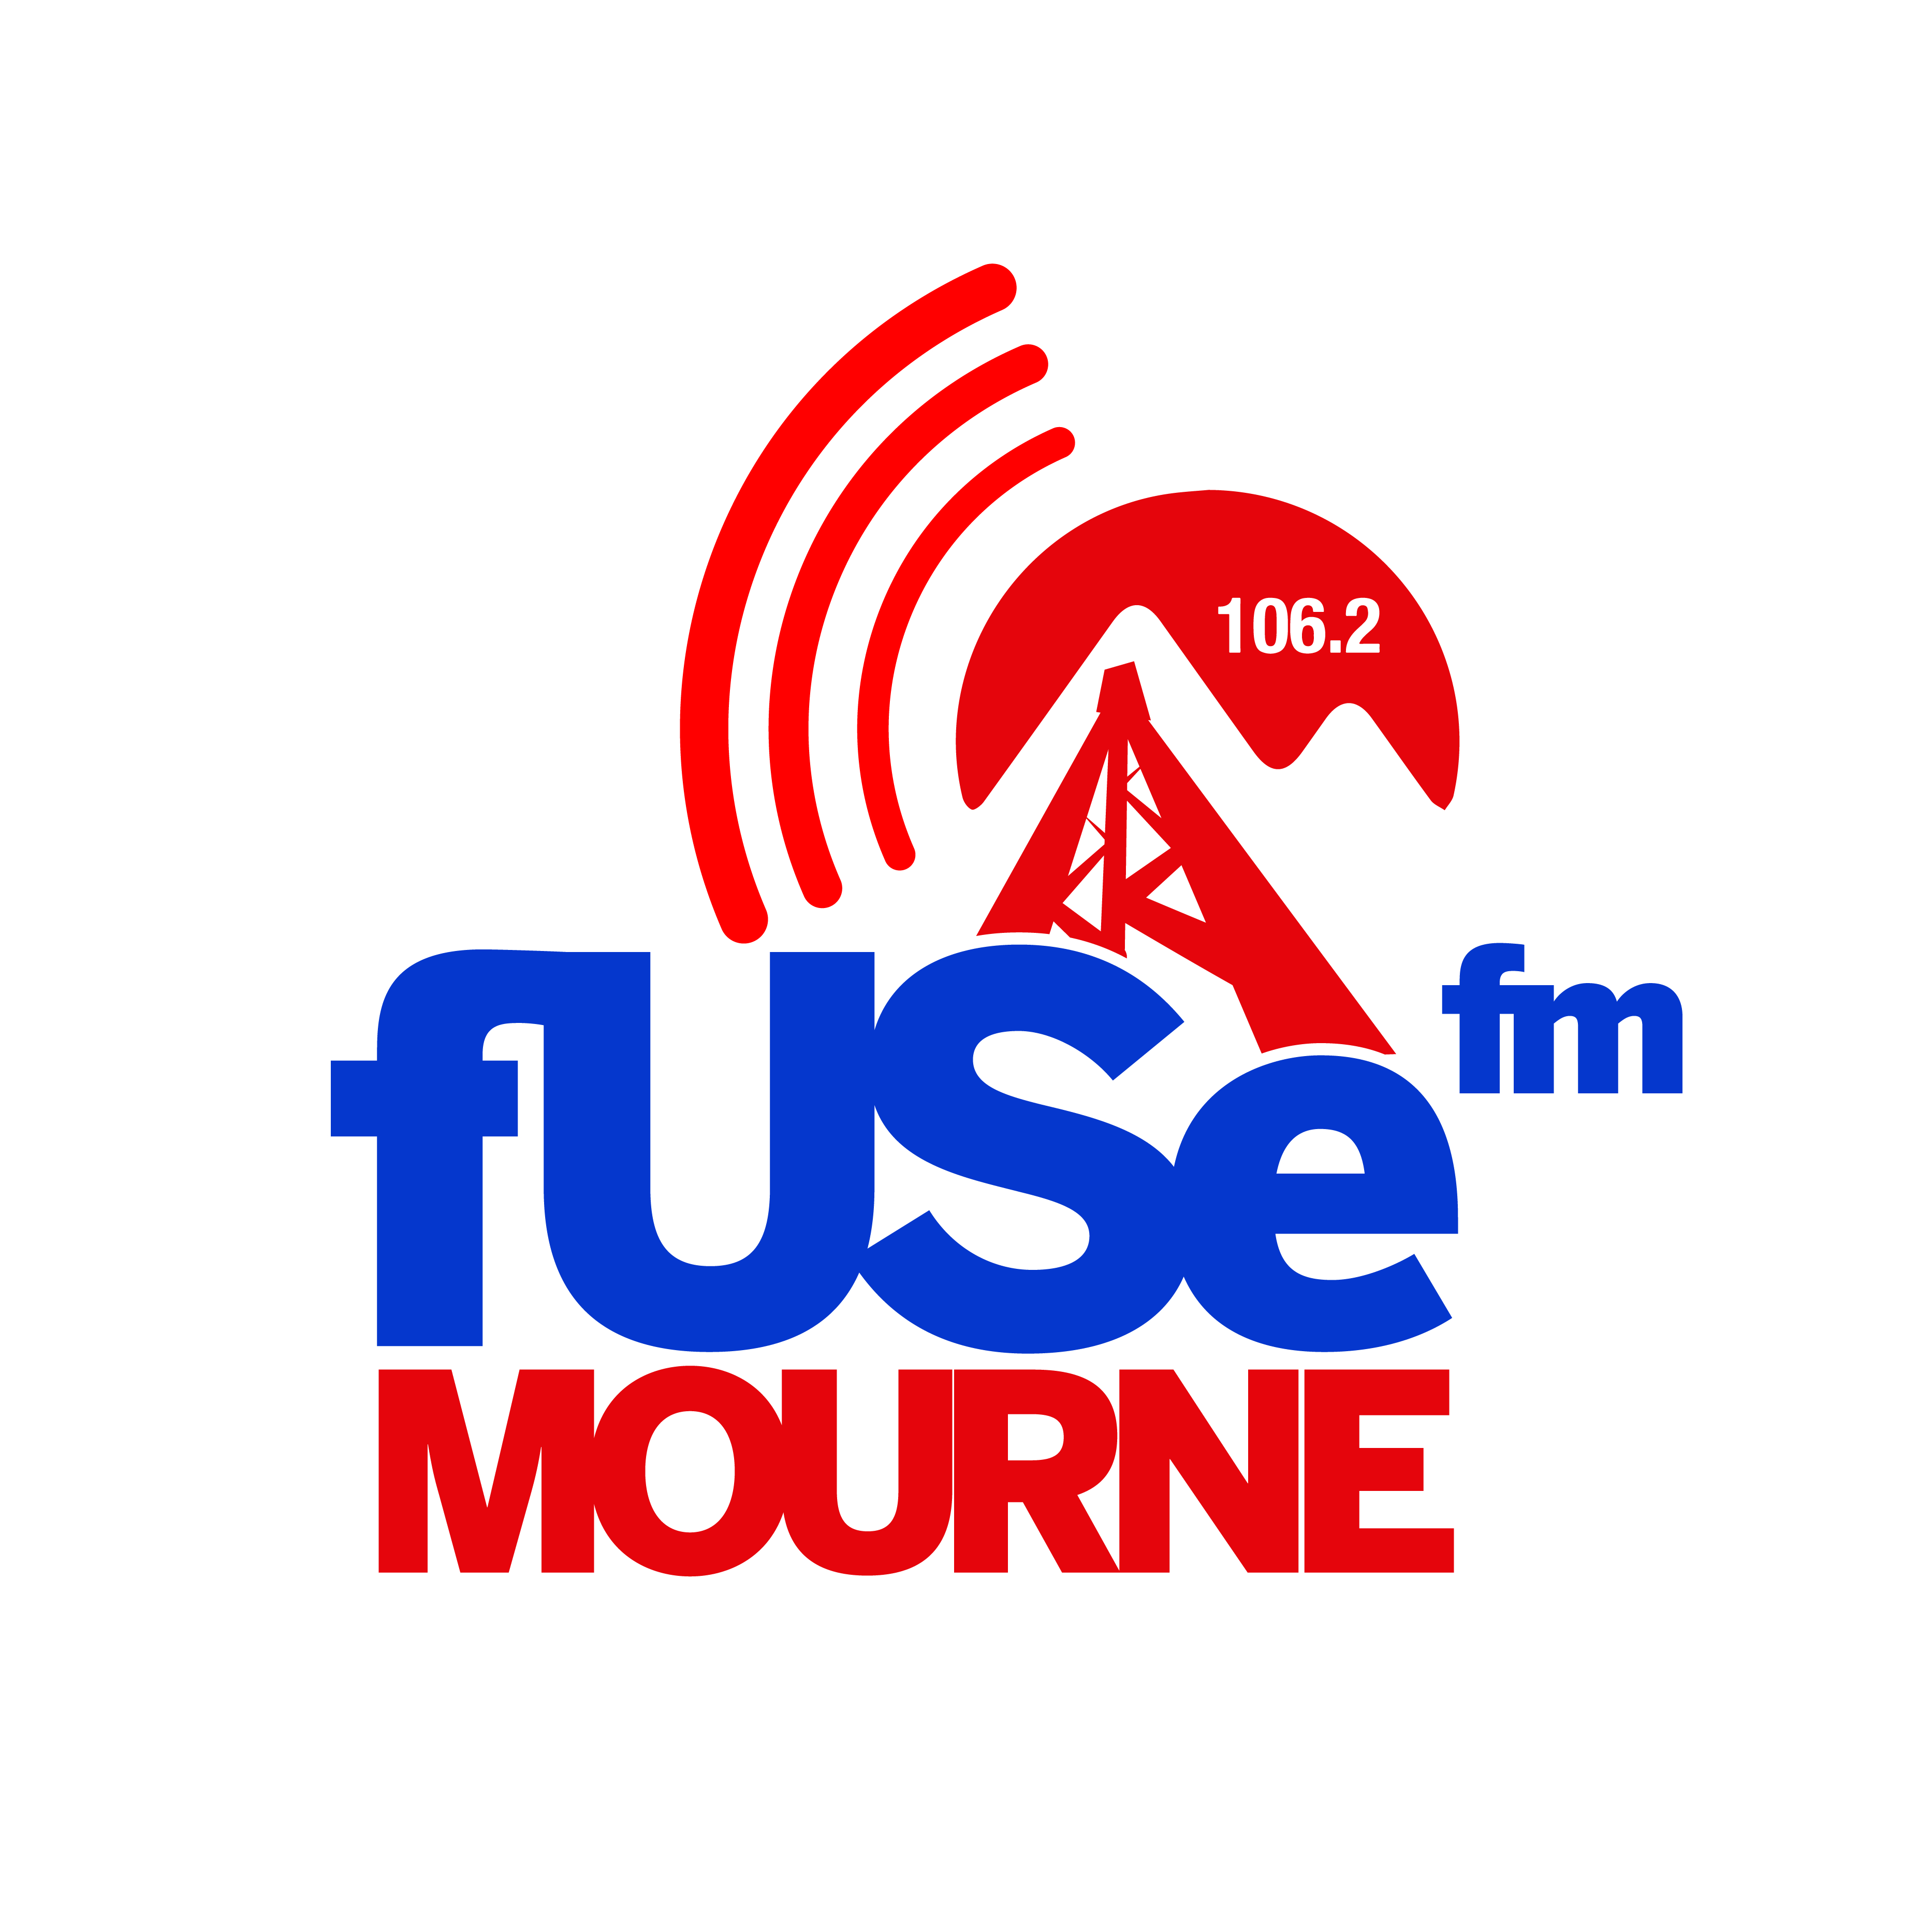 FuseFM